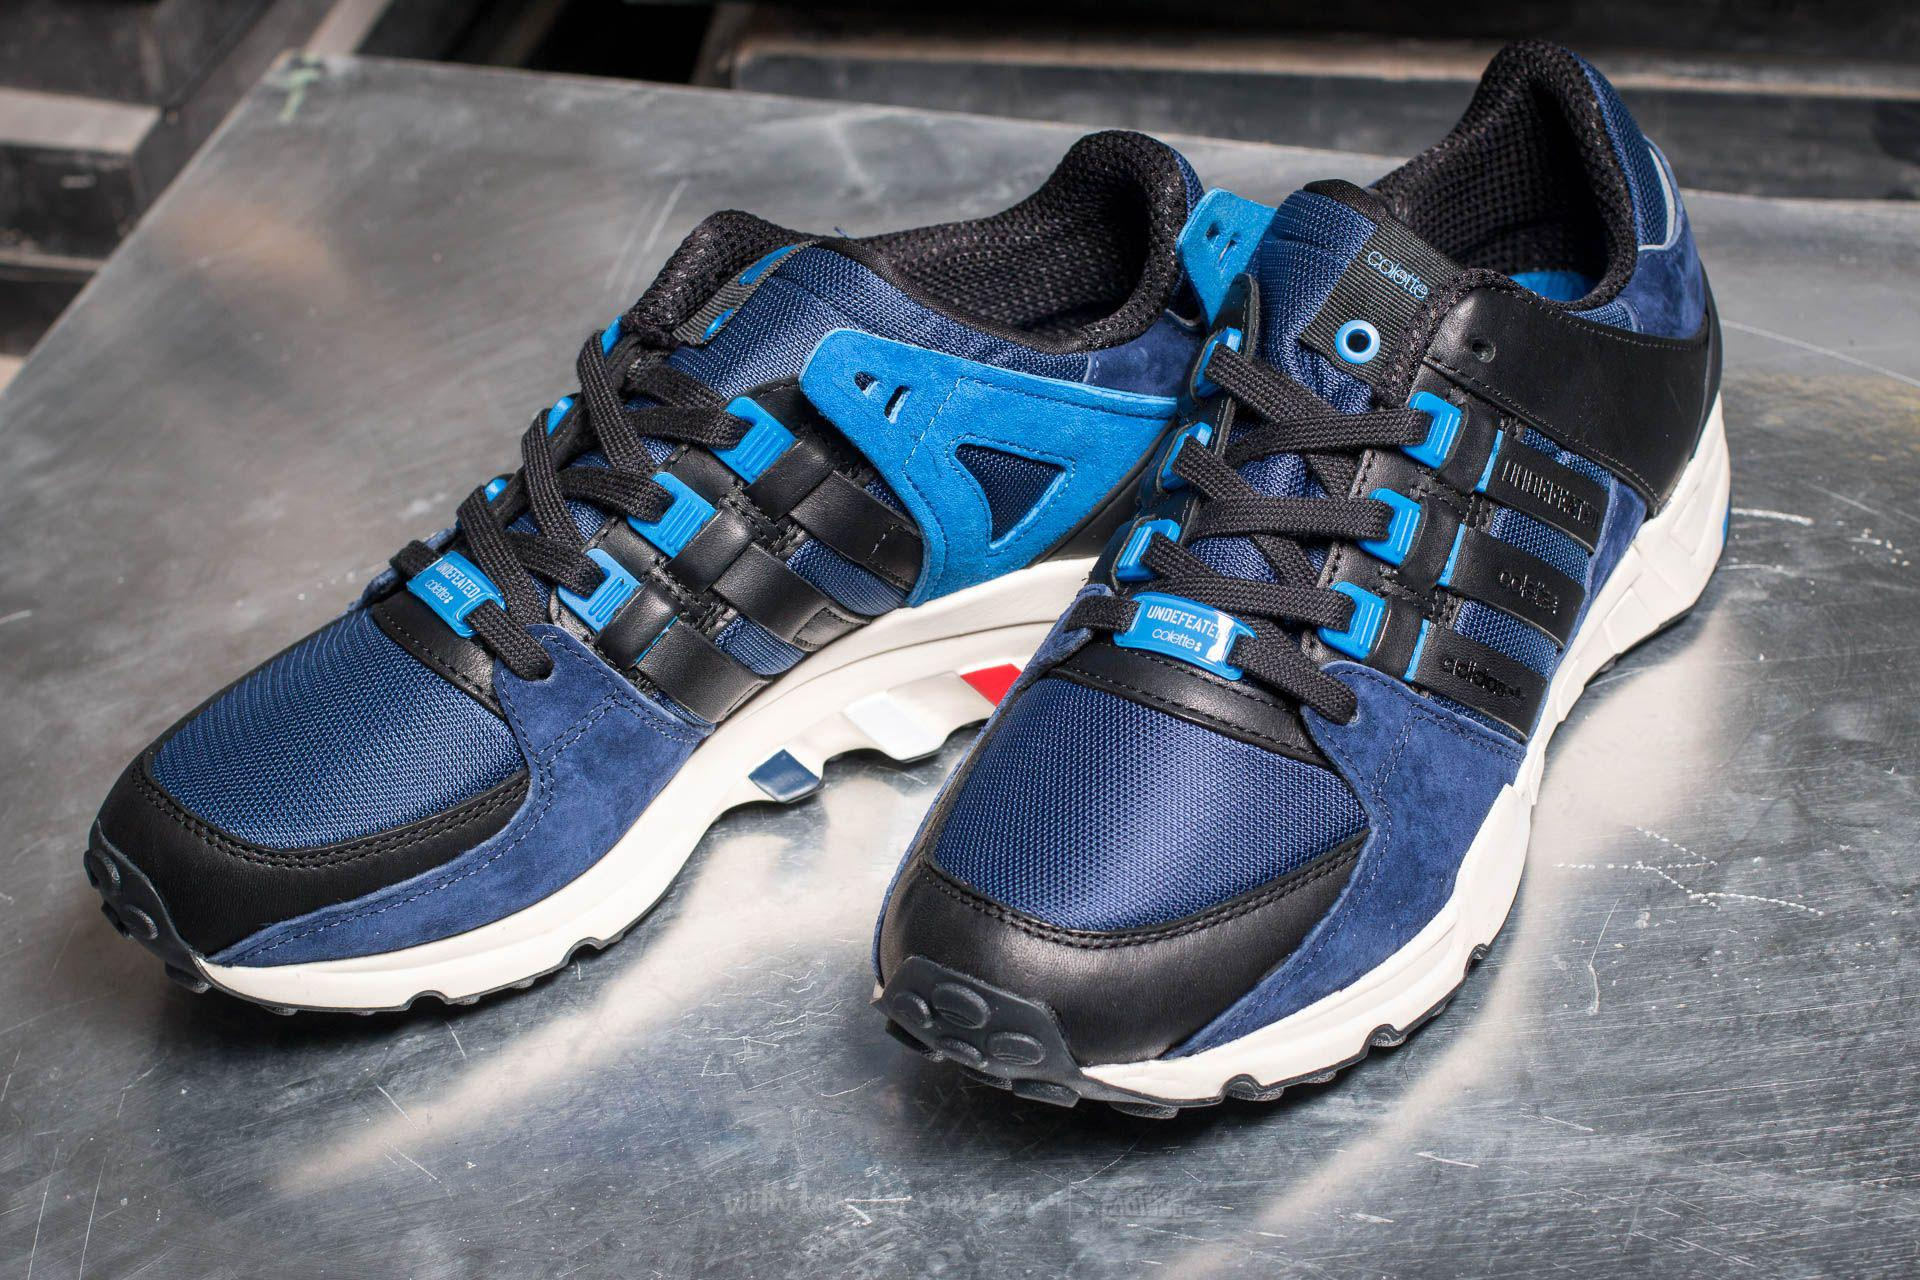 ab964c7c664 Lyst - Footshop Adidas X Colette X Undefeated Eqt Support S.e. Dark ...